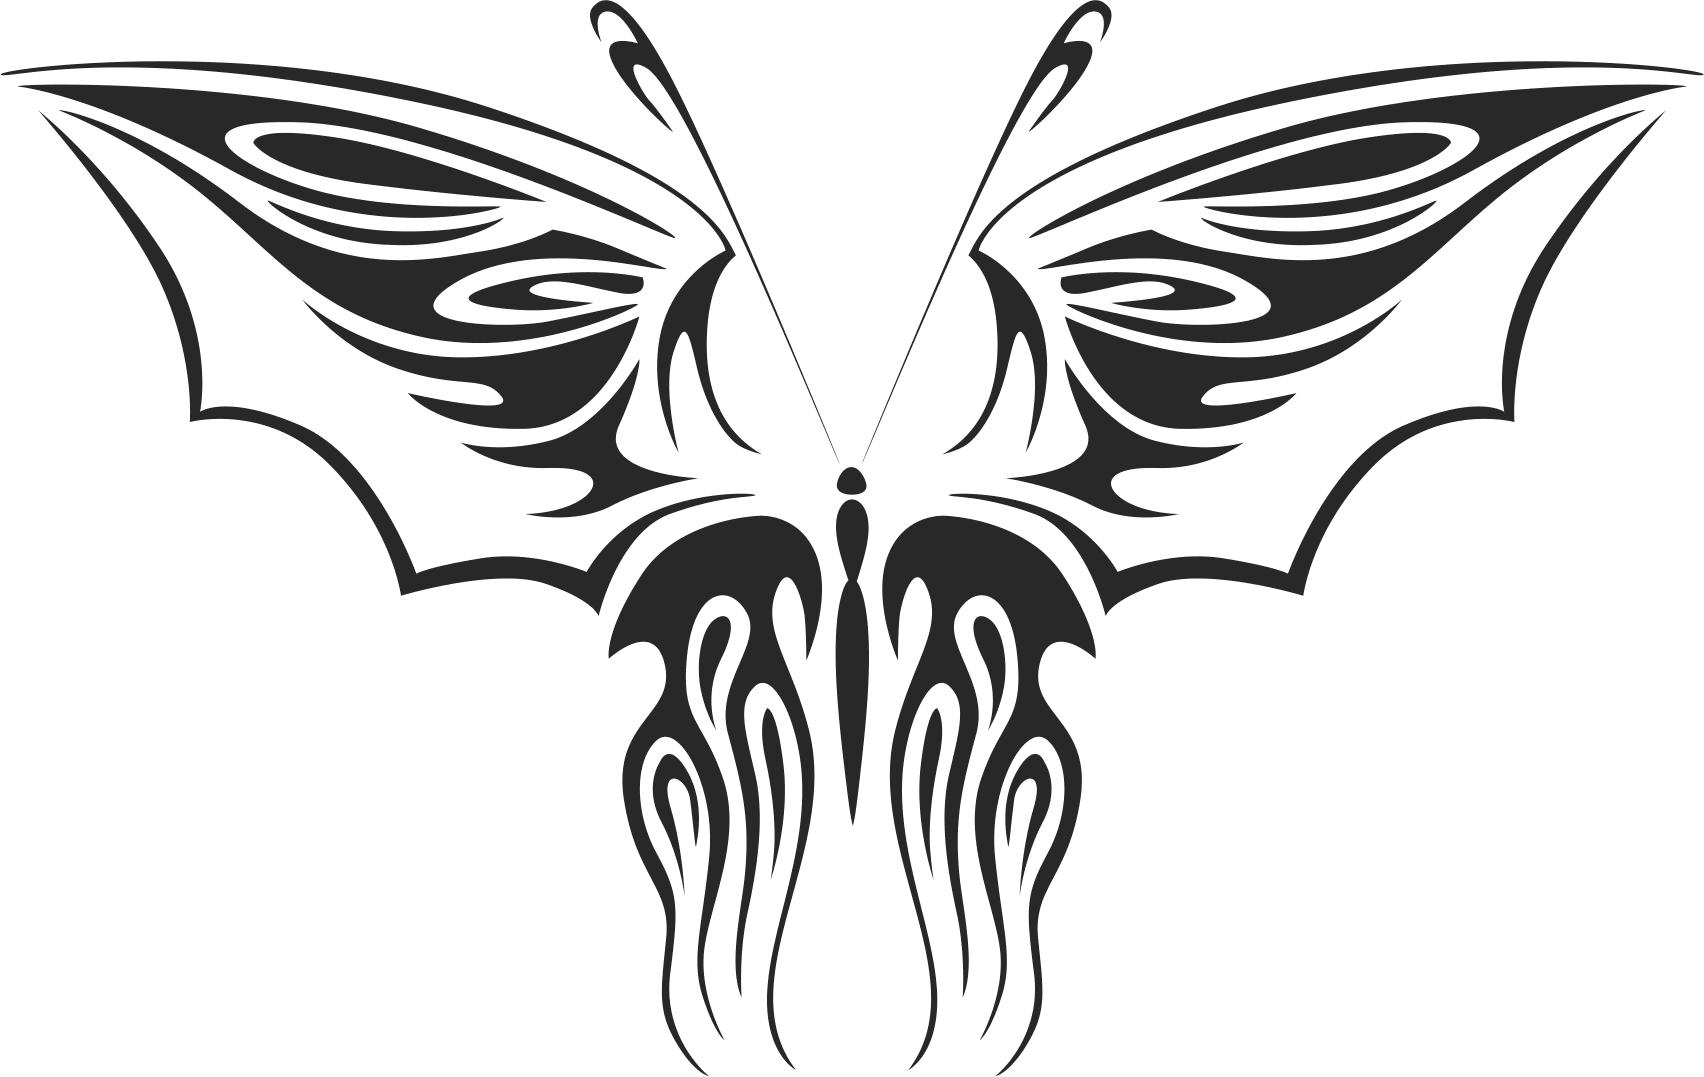 Butterfly Vector Art 012 Free CDR Vectors Art